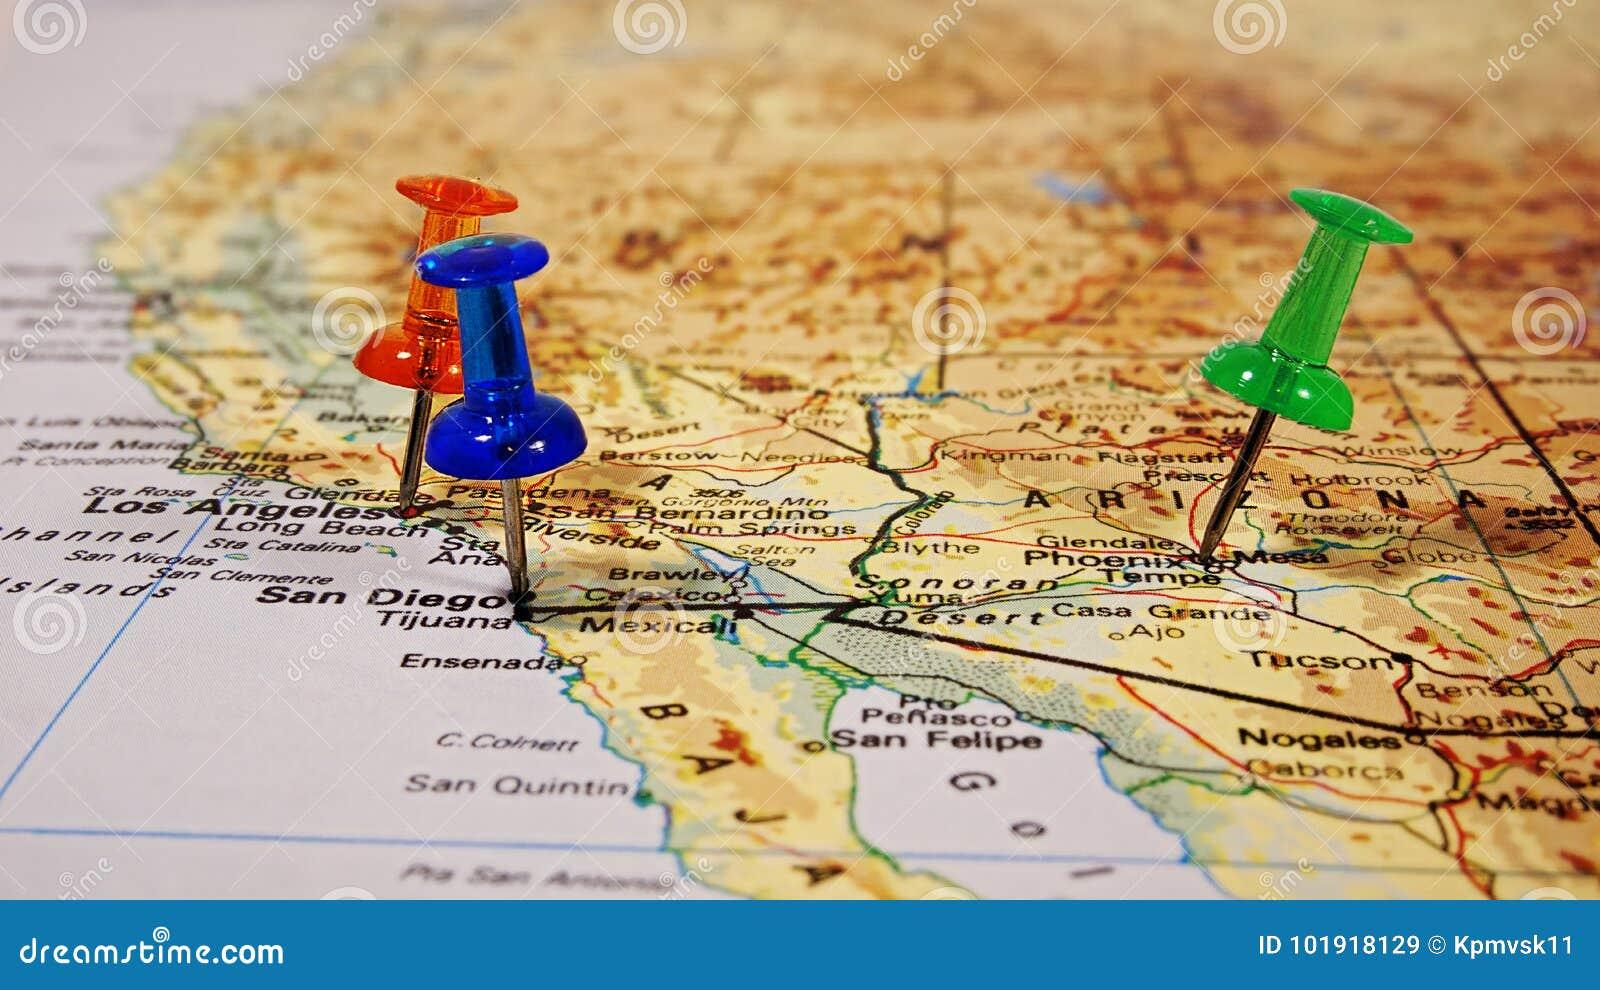 Map Of Arizona Destinations.Map With Pushpins Stock Image Image Of Vacations Destinations